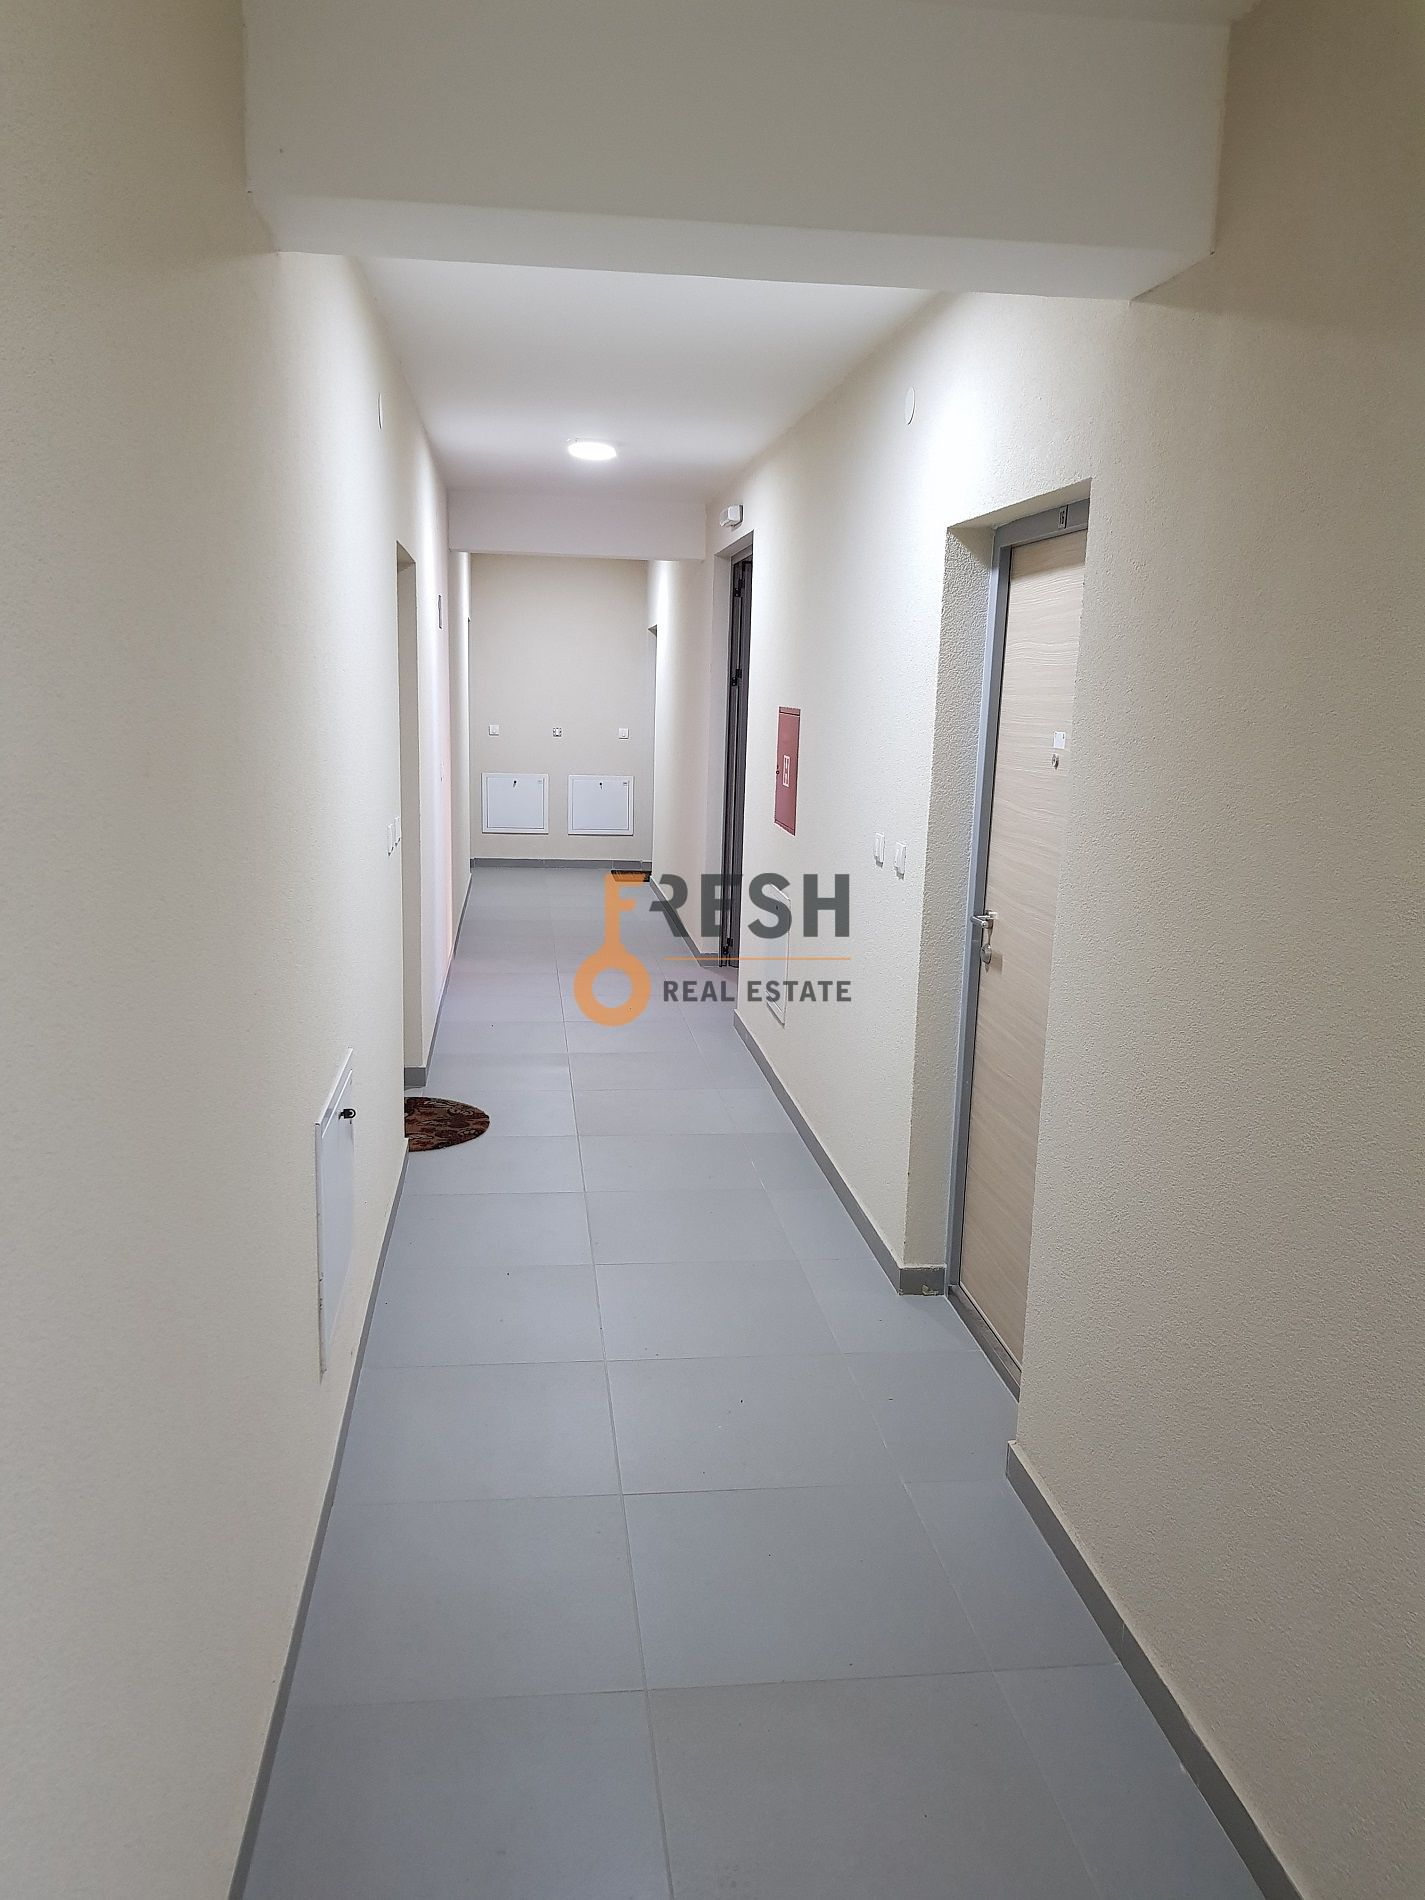 Jednosoban stan 45 m2, Centar, Pljevlja, Prodaja - 3